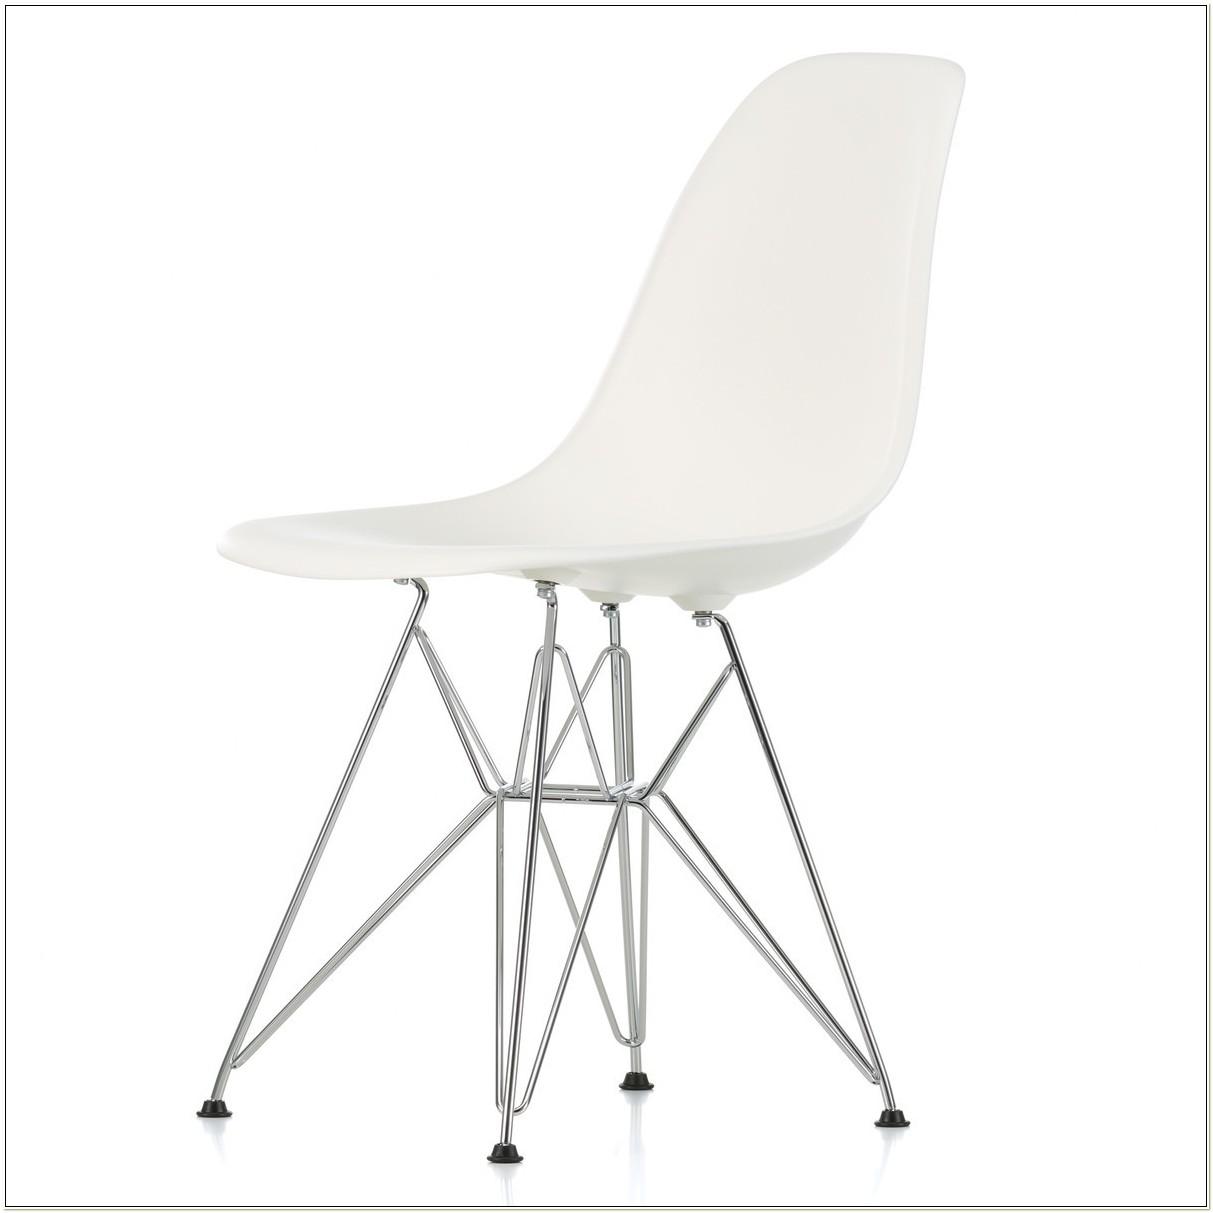 Vitra Eames Dsr Side Chair White